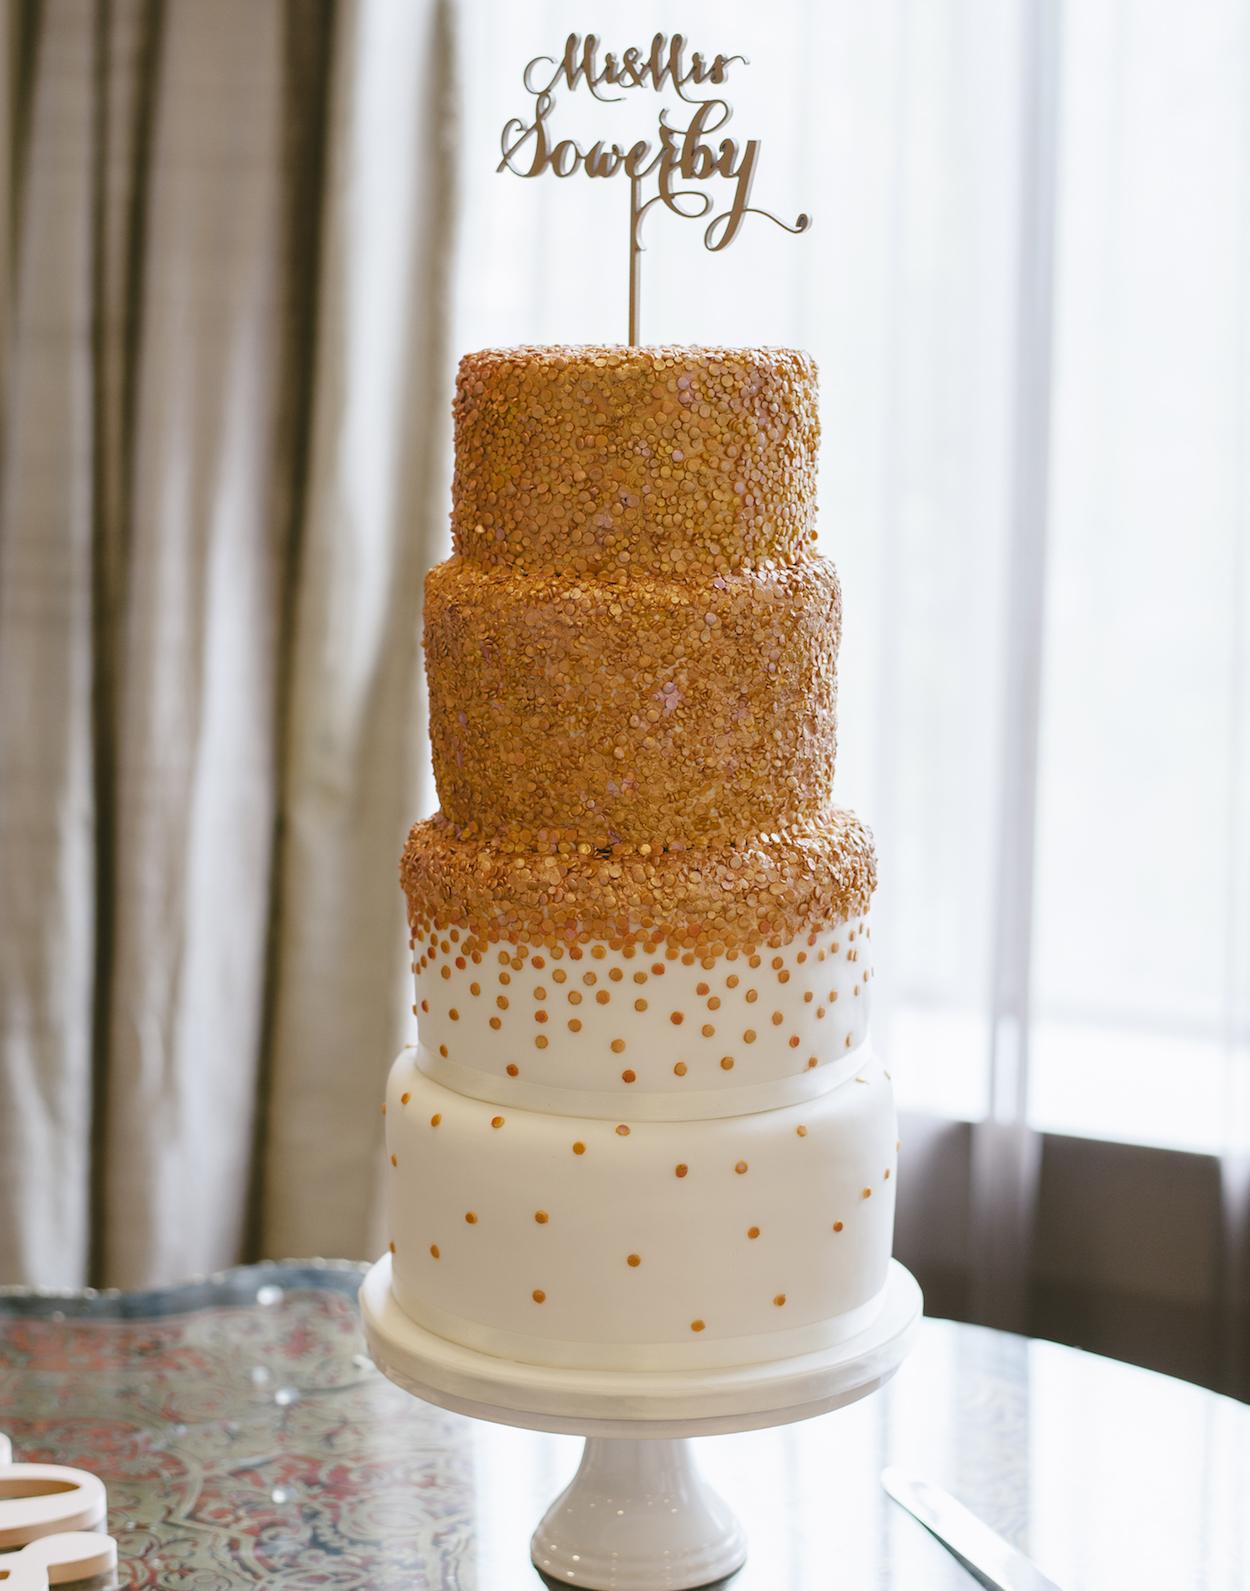 Francis_meaney_photography_merchant_hotel_wedding_belfast_inspire_weddings_14.jpg